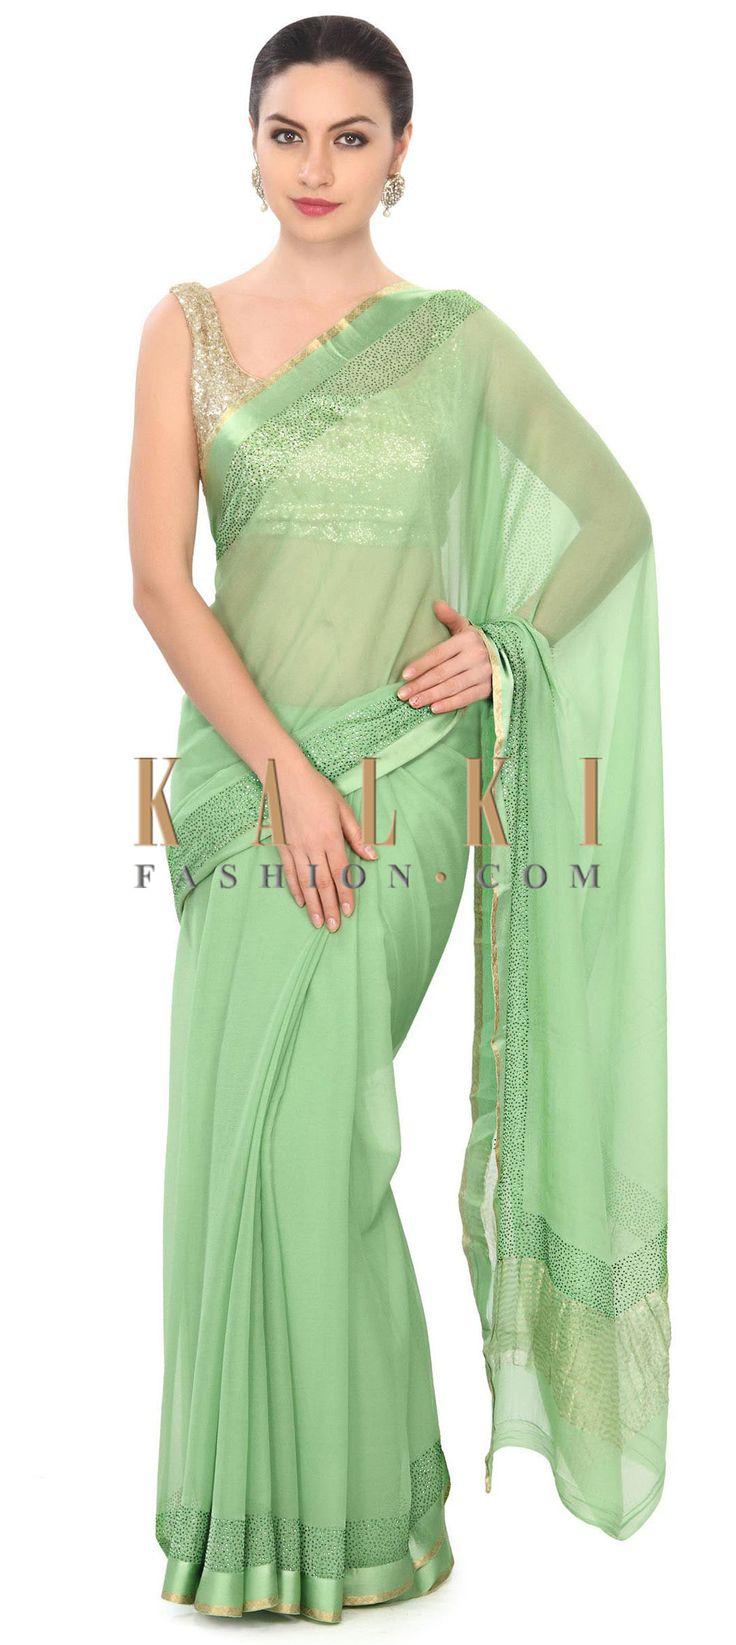 Buy this Green saree highlighted in kundan border only on Kalki